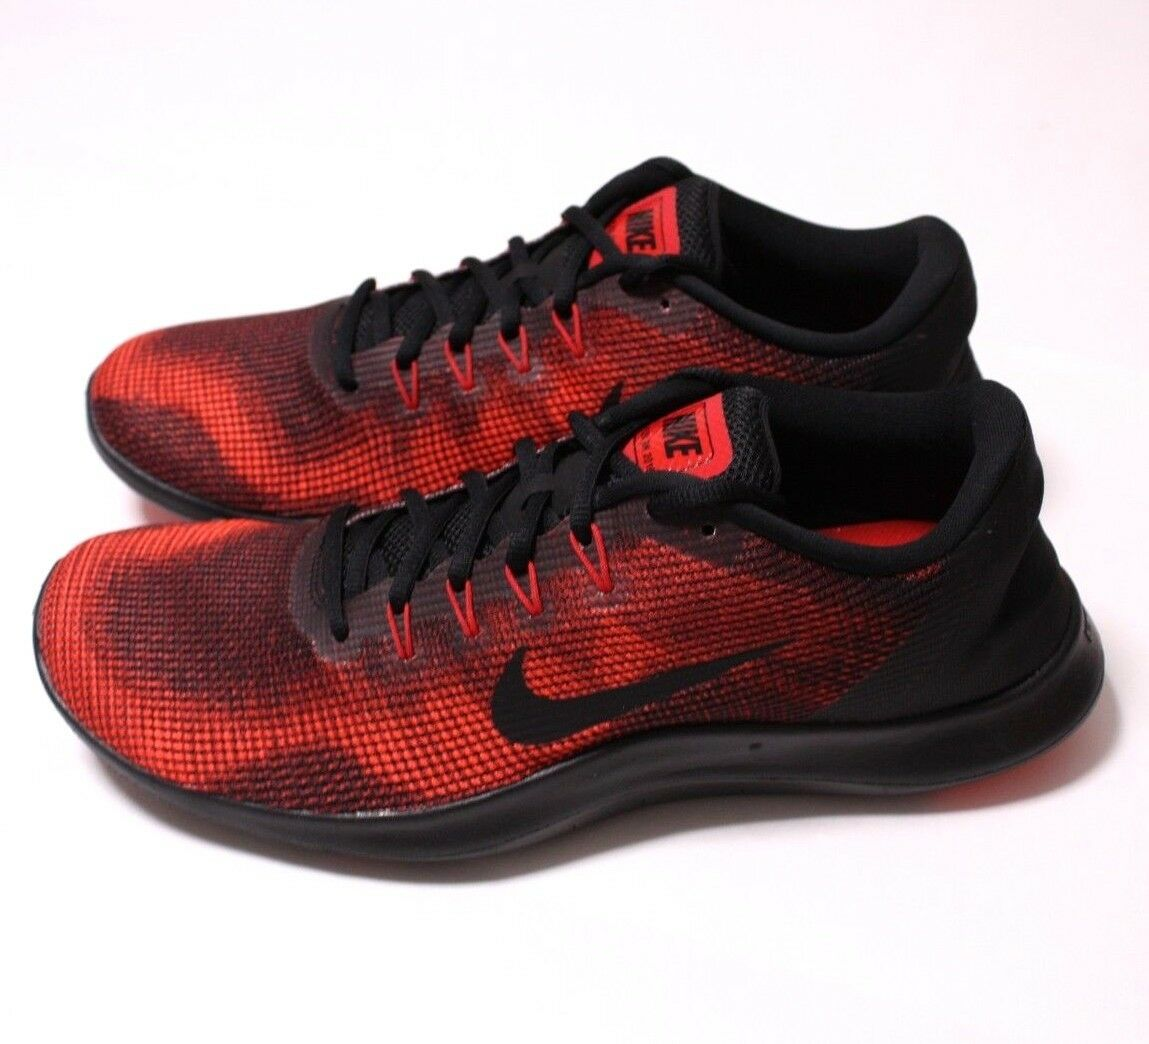 Nike Flex 2018 RN Uomo Running Shoes, Size 12.5, AA7397 008